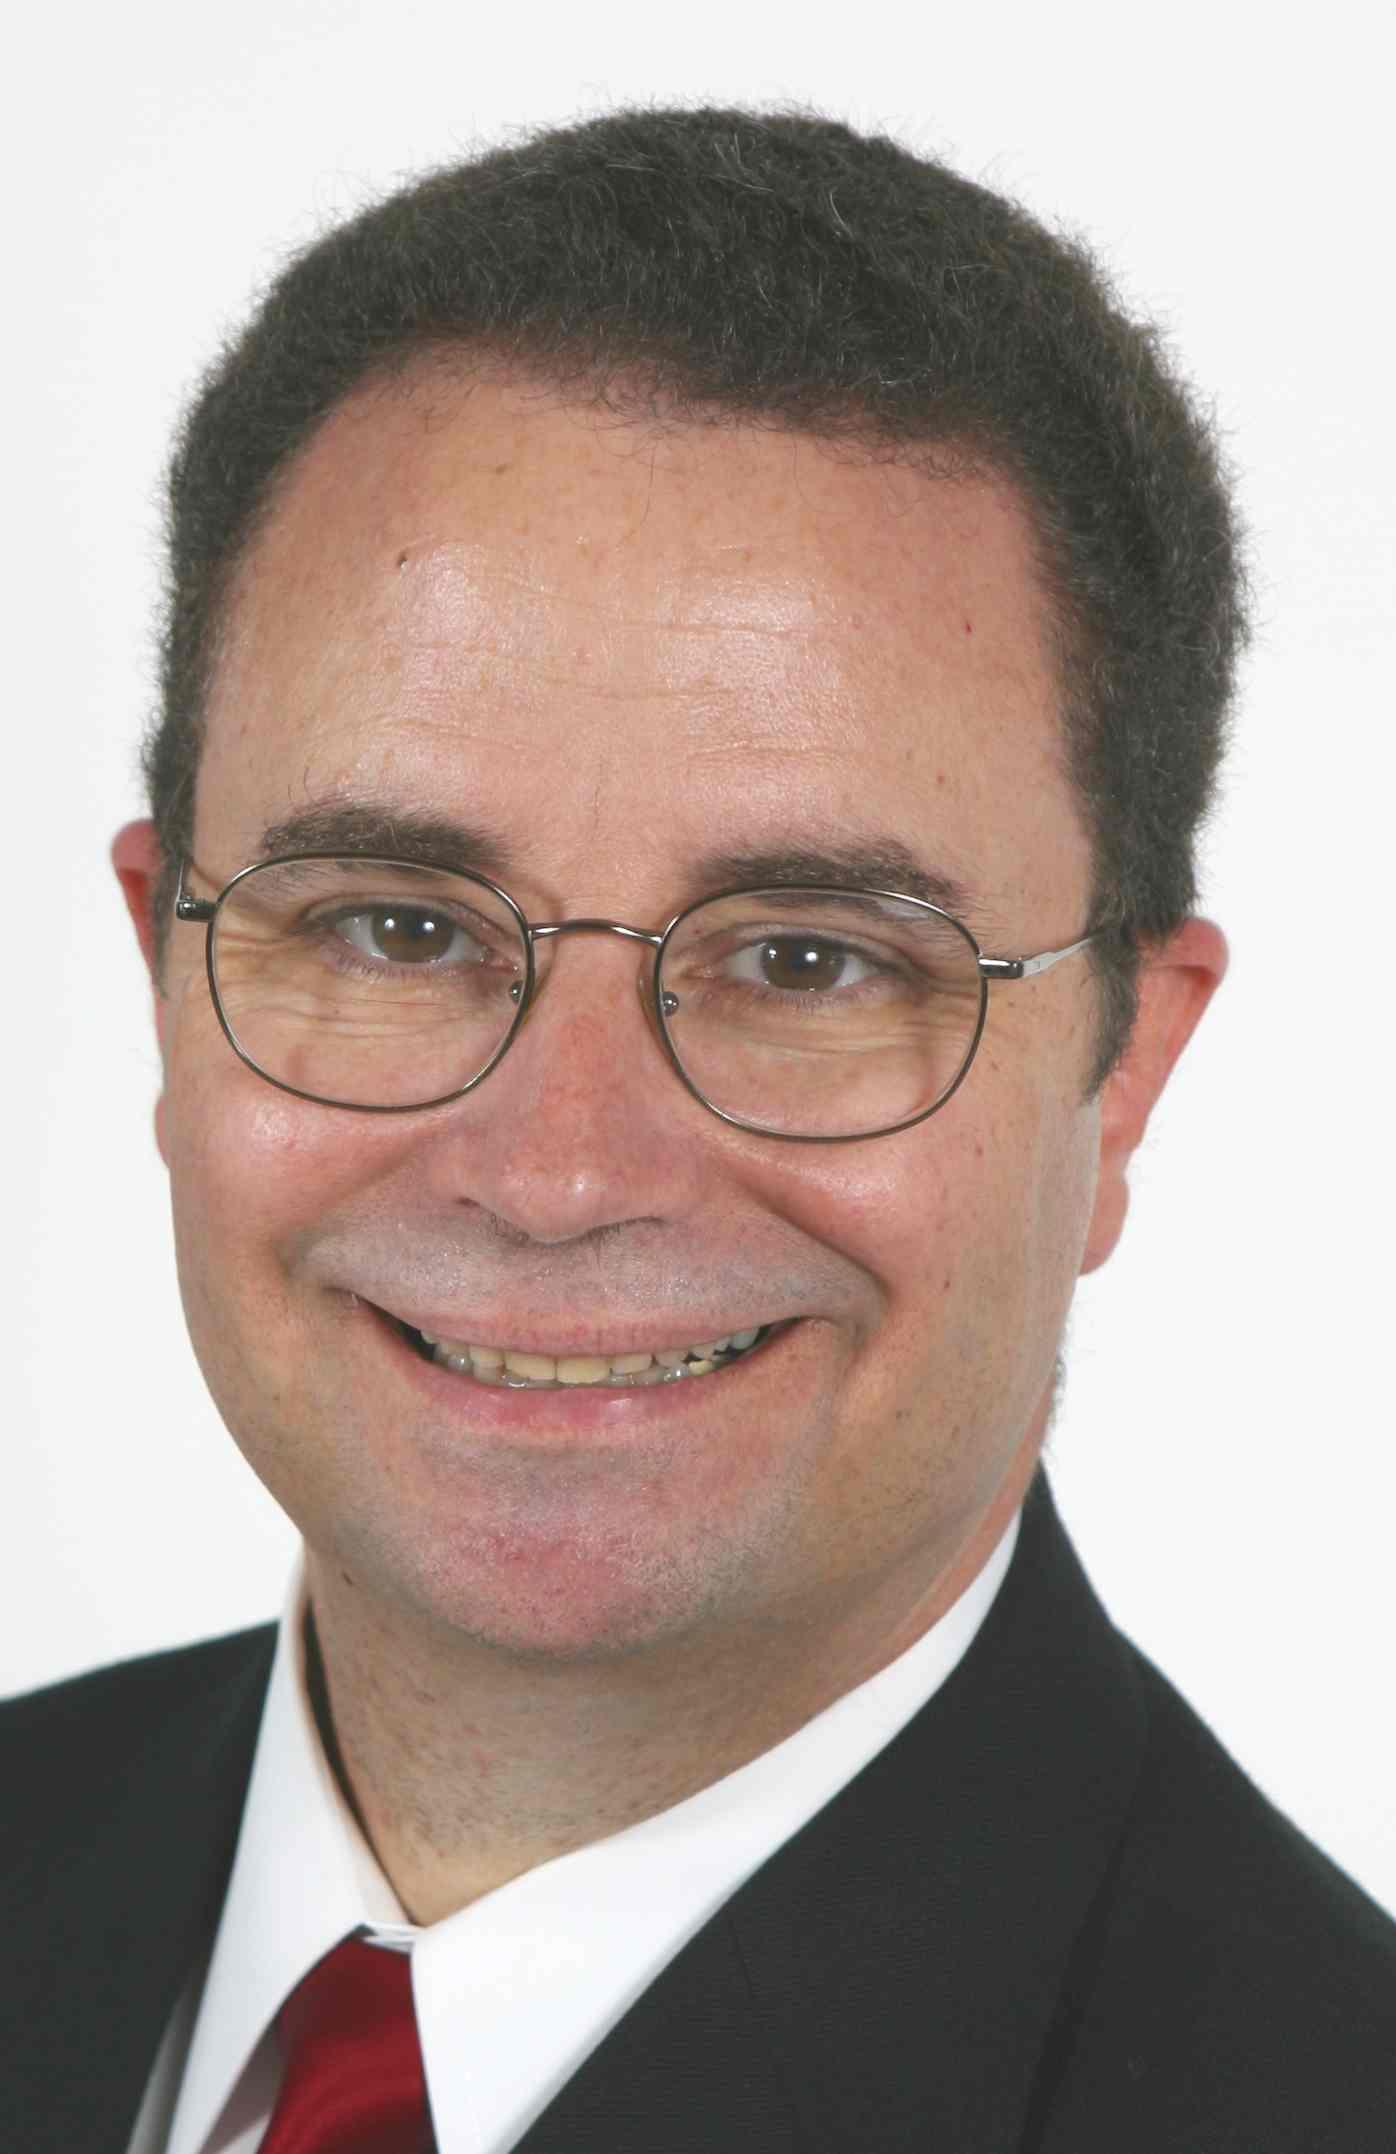 David Latch, financial advisor The Villages FL